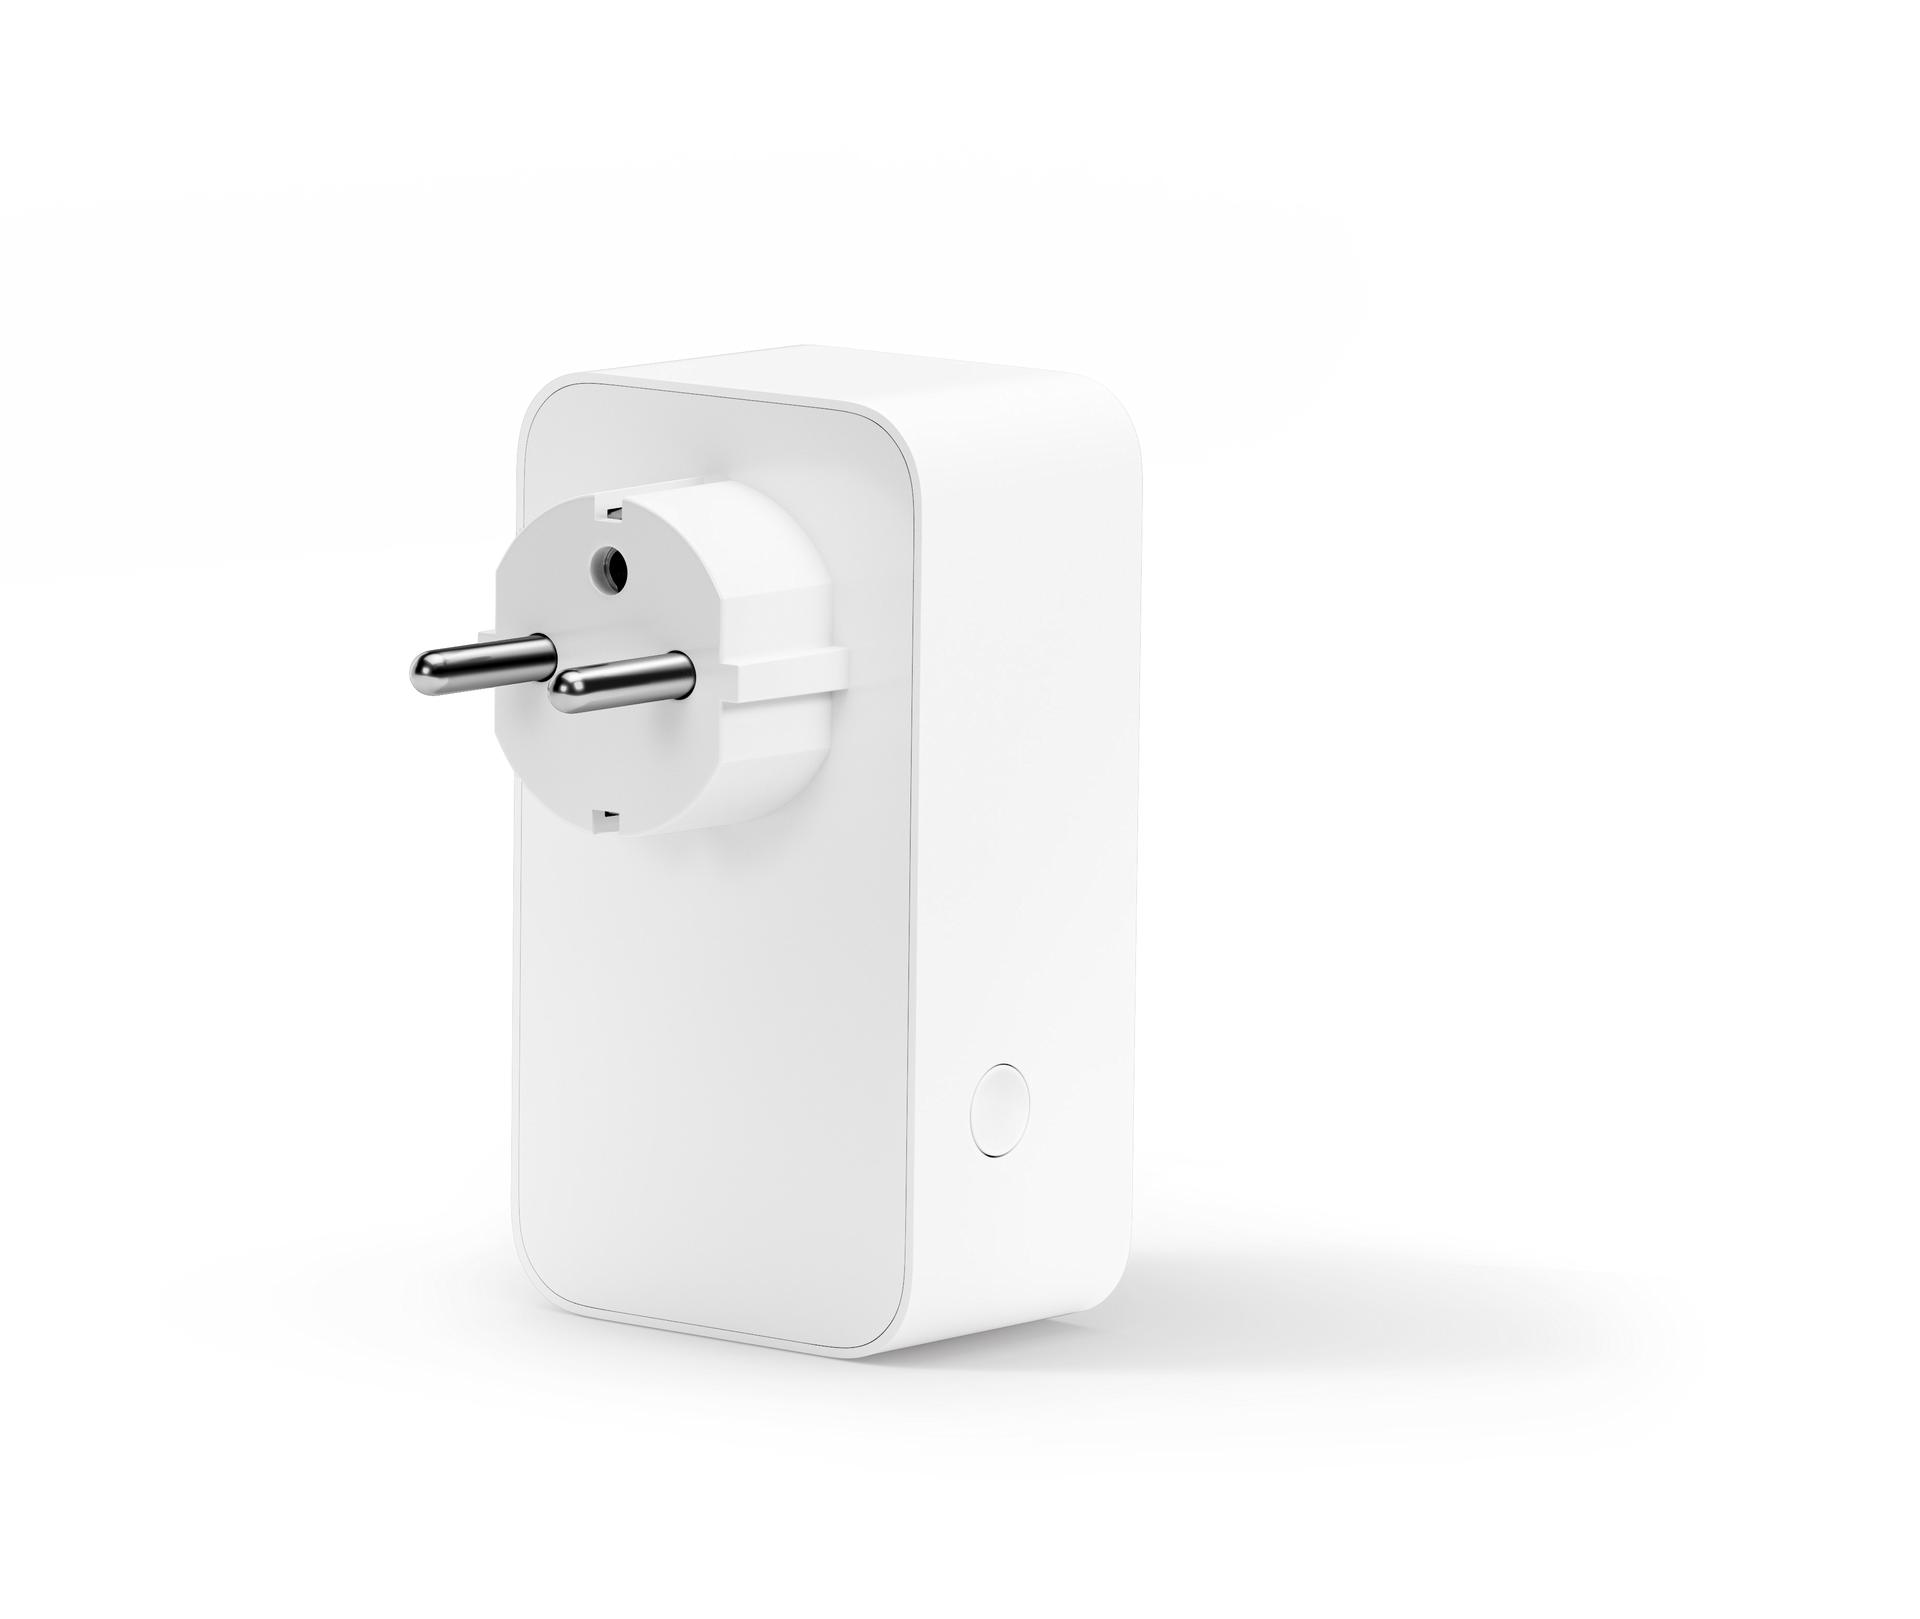 Smart Plug: Amazon bringt eigene smarte Steckdose auf den Markt - Smart Plug (Bild: Amazon)